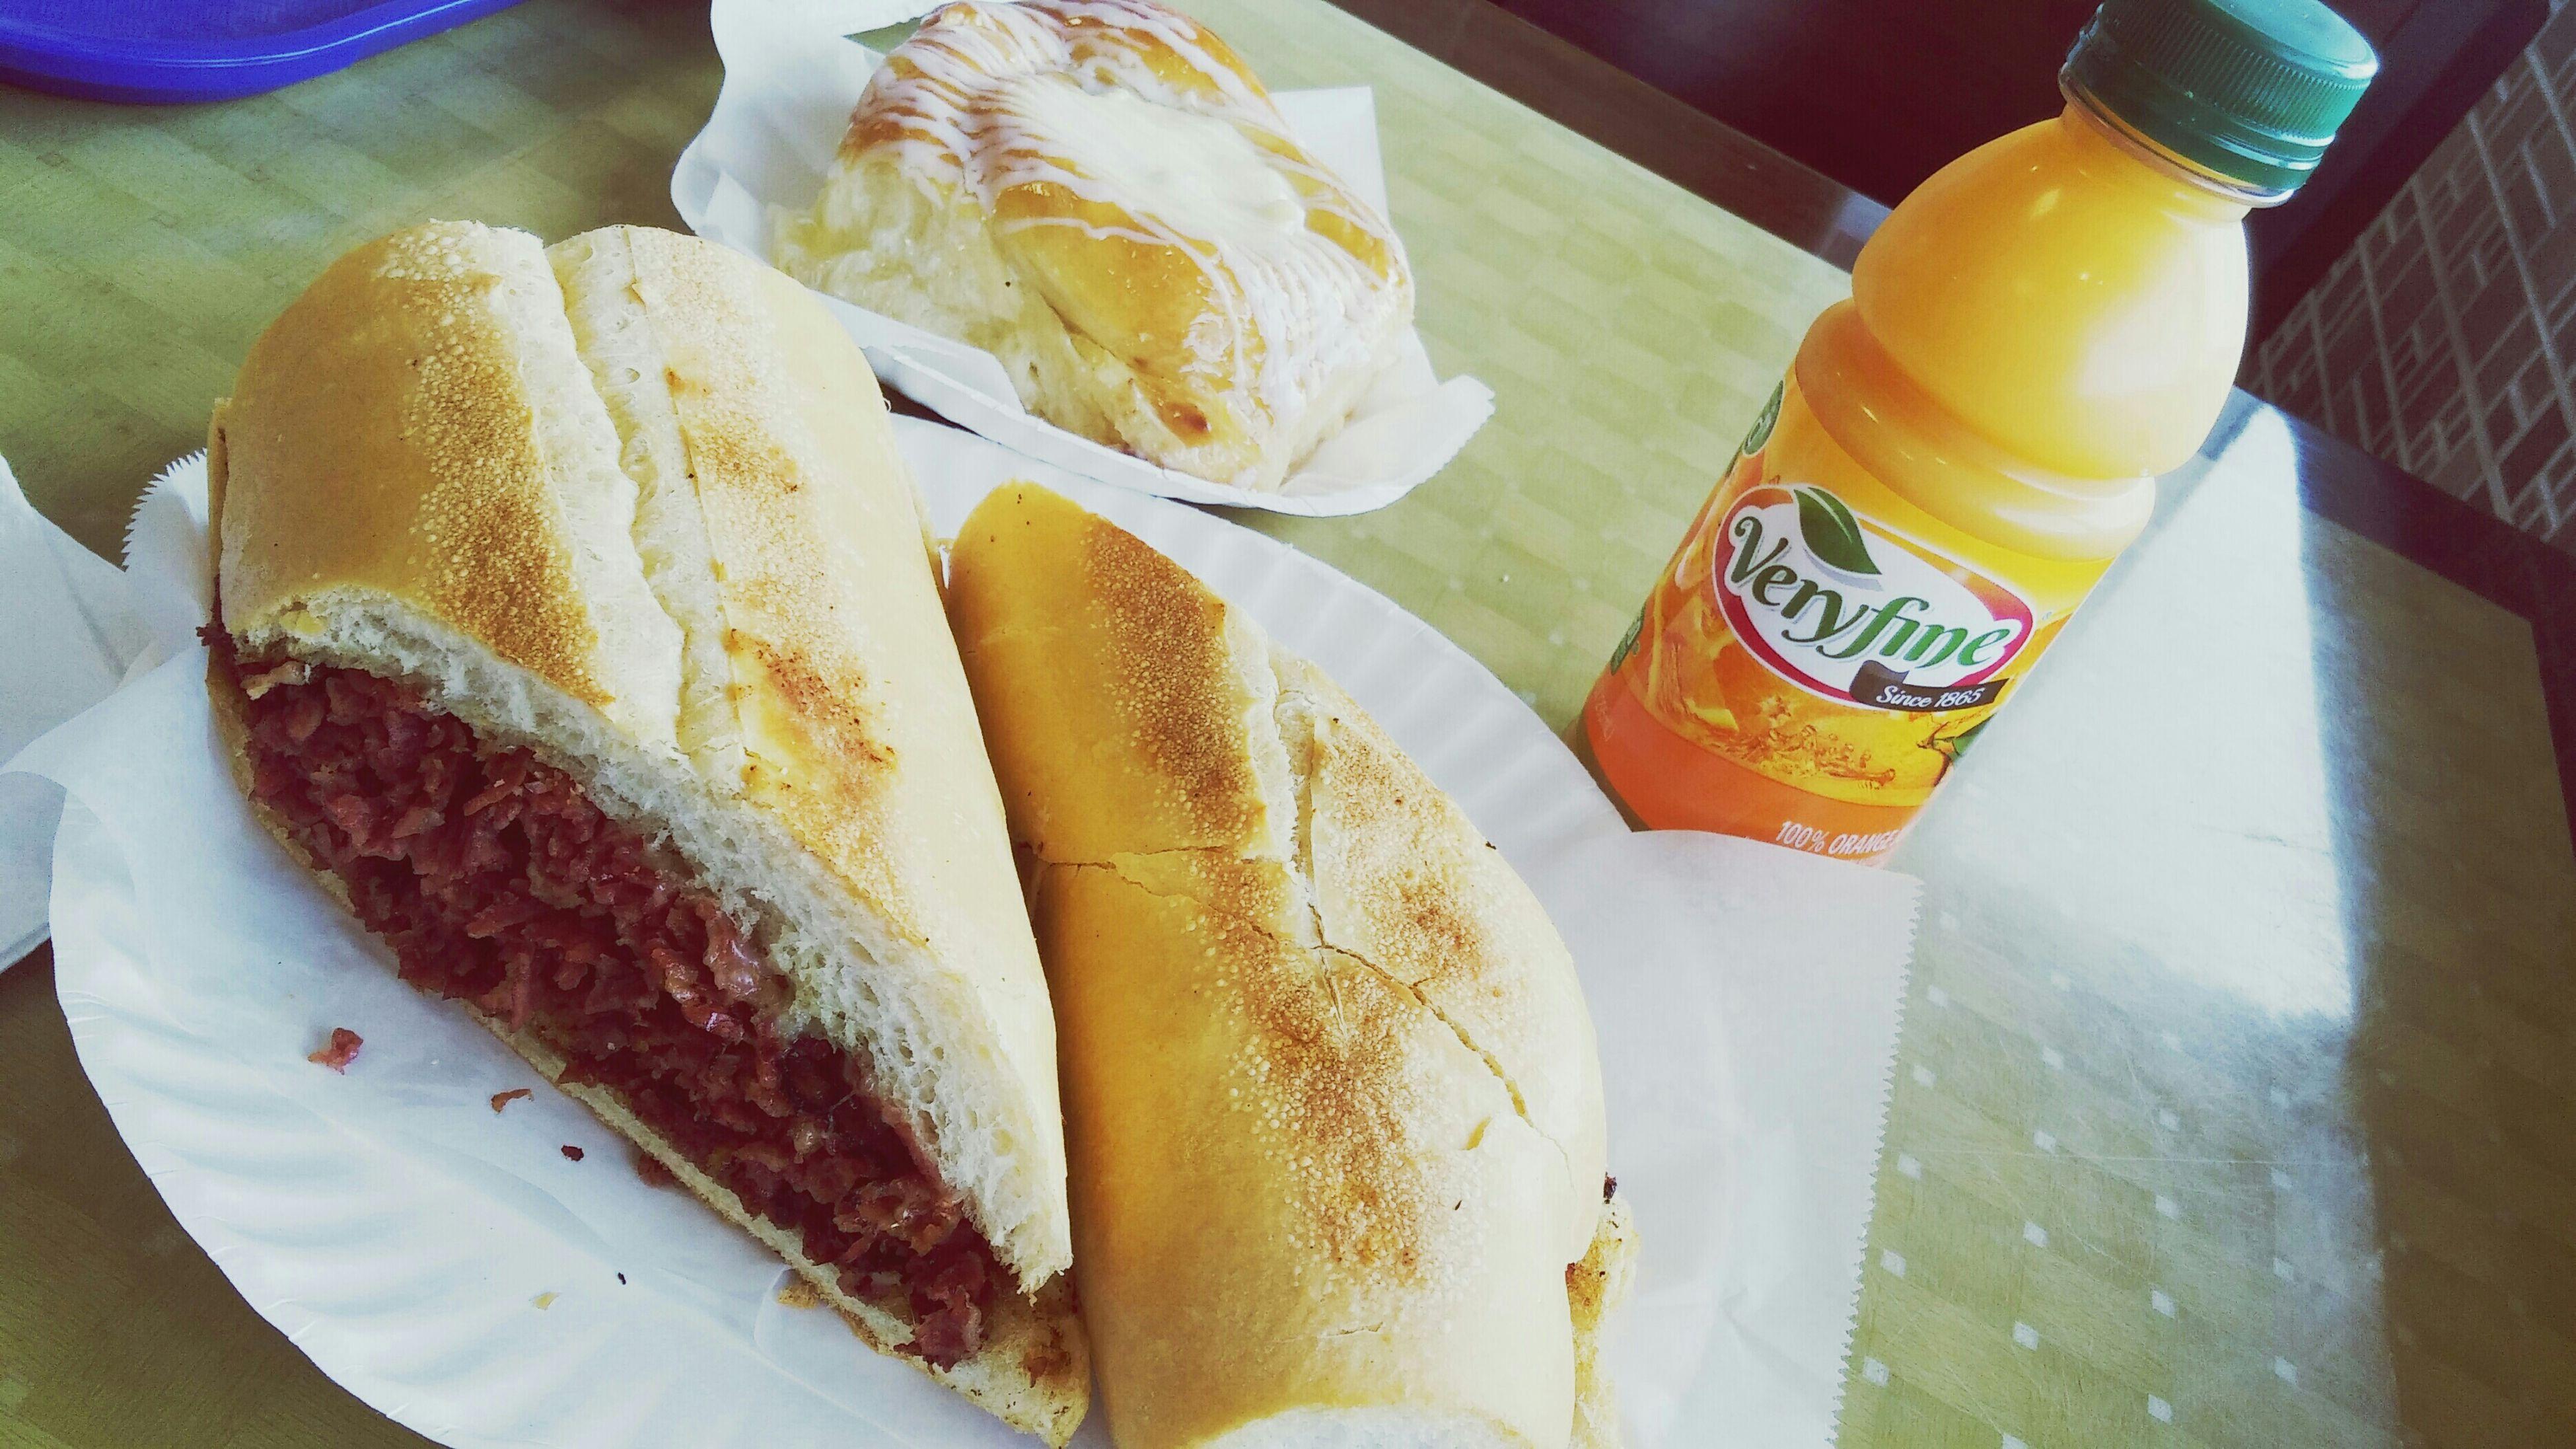 Pastramisandwich Pastrami Sandwich Orangejuice Mayorca Veryfine